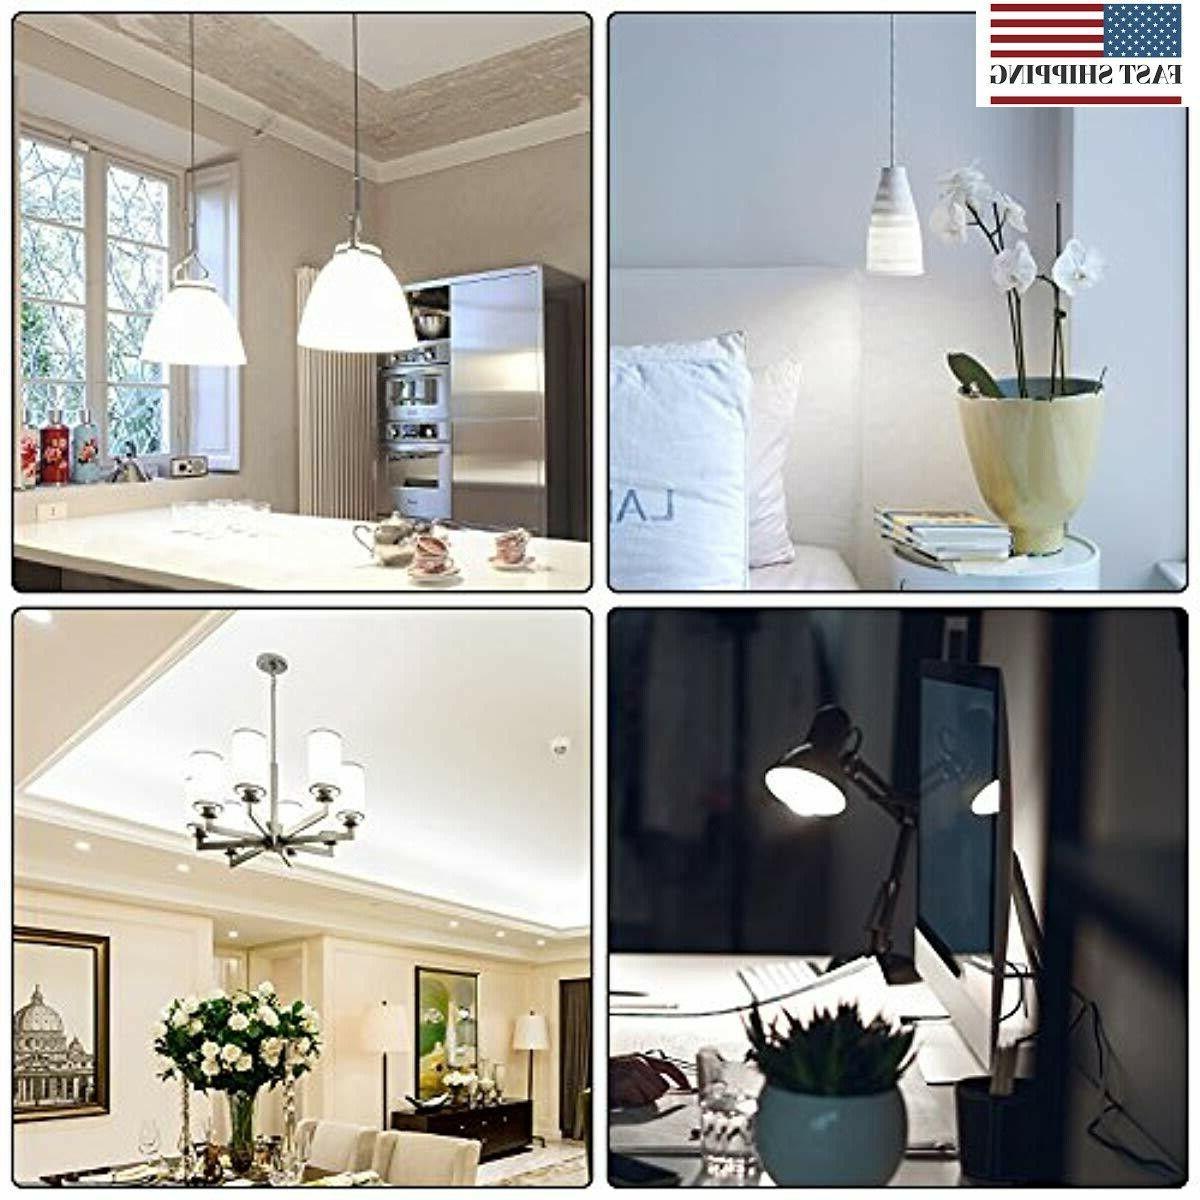 6 LED Candelabra Bulb 50W 5000K Daylight Whit